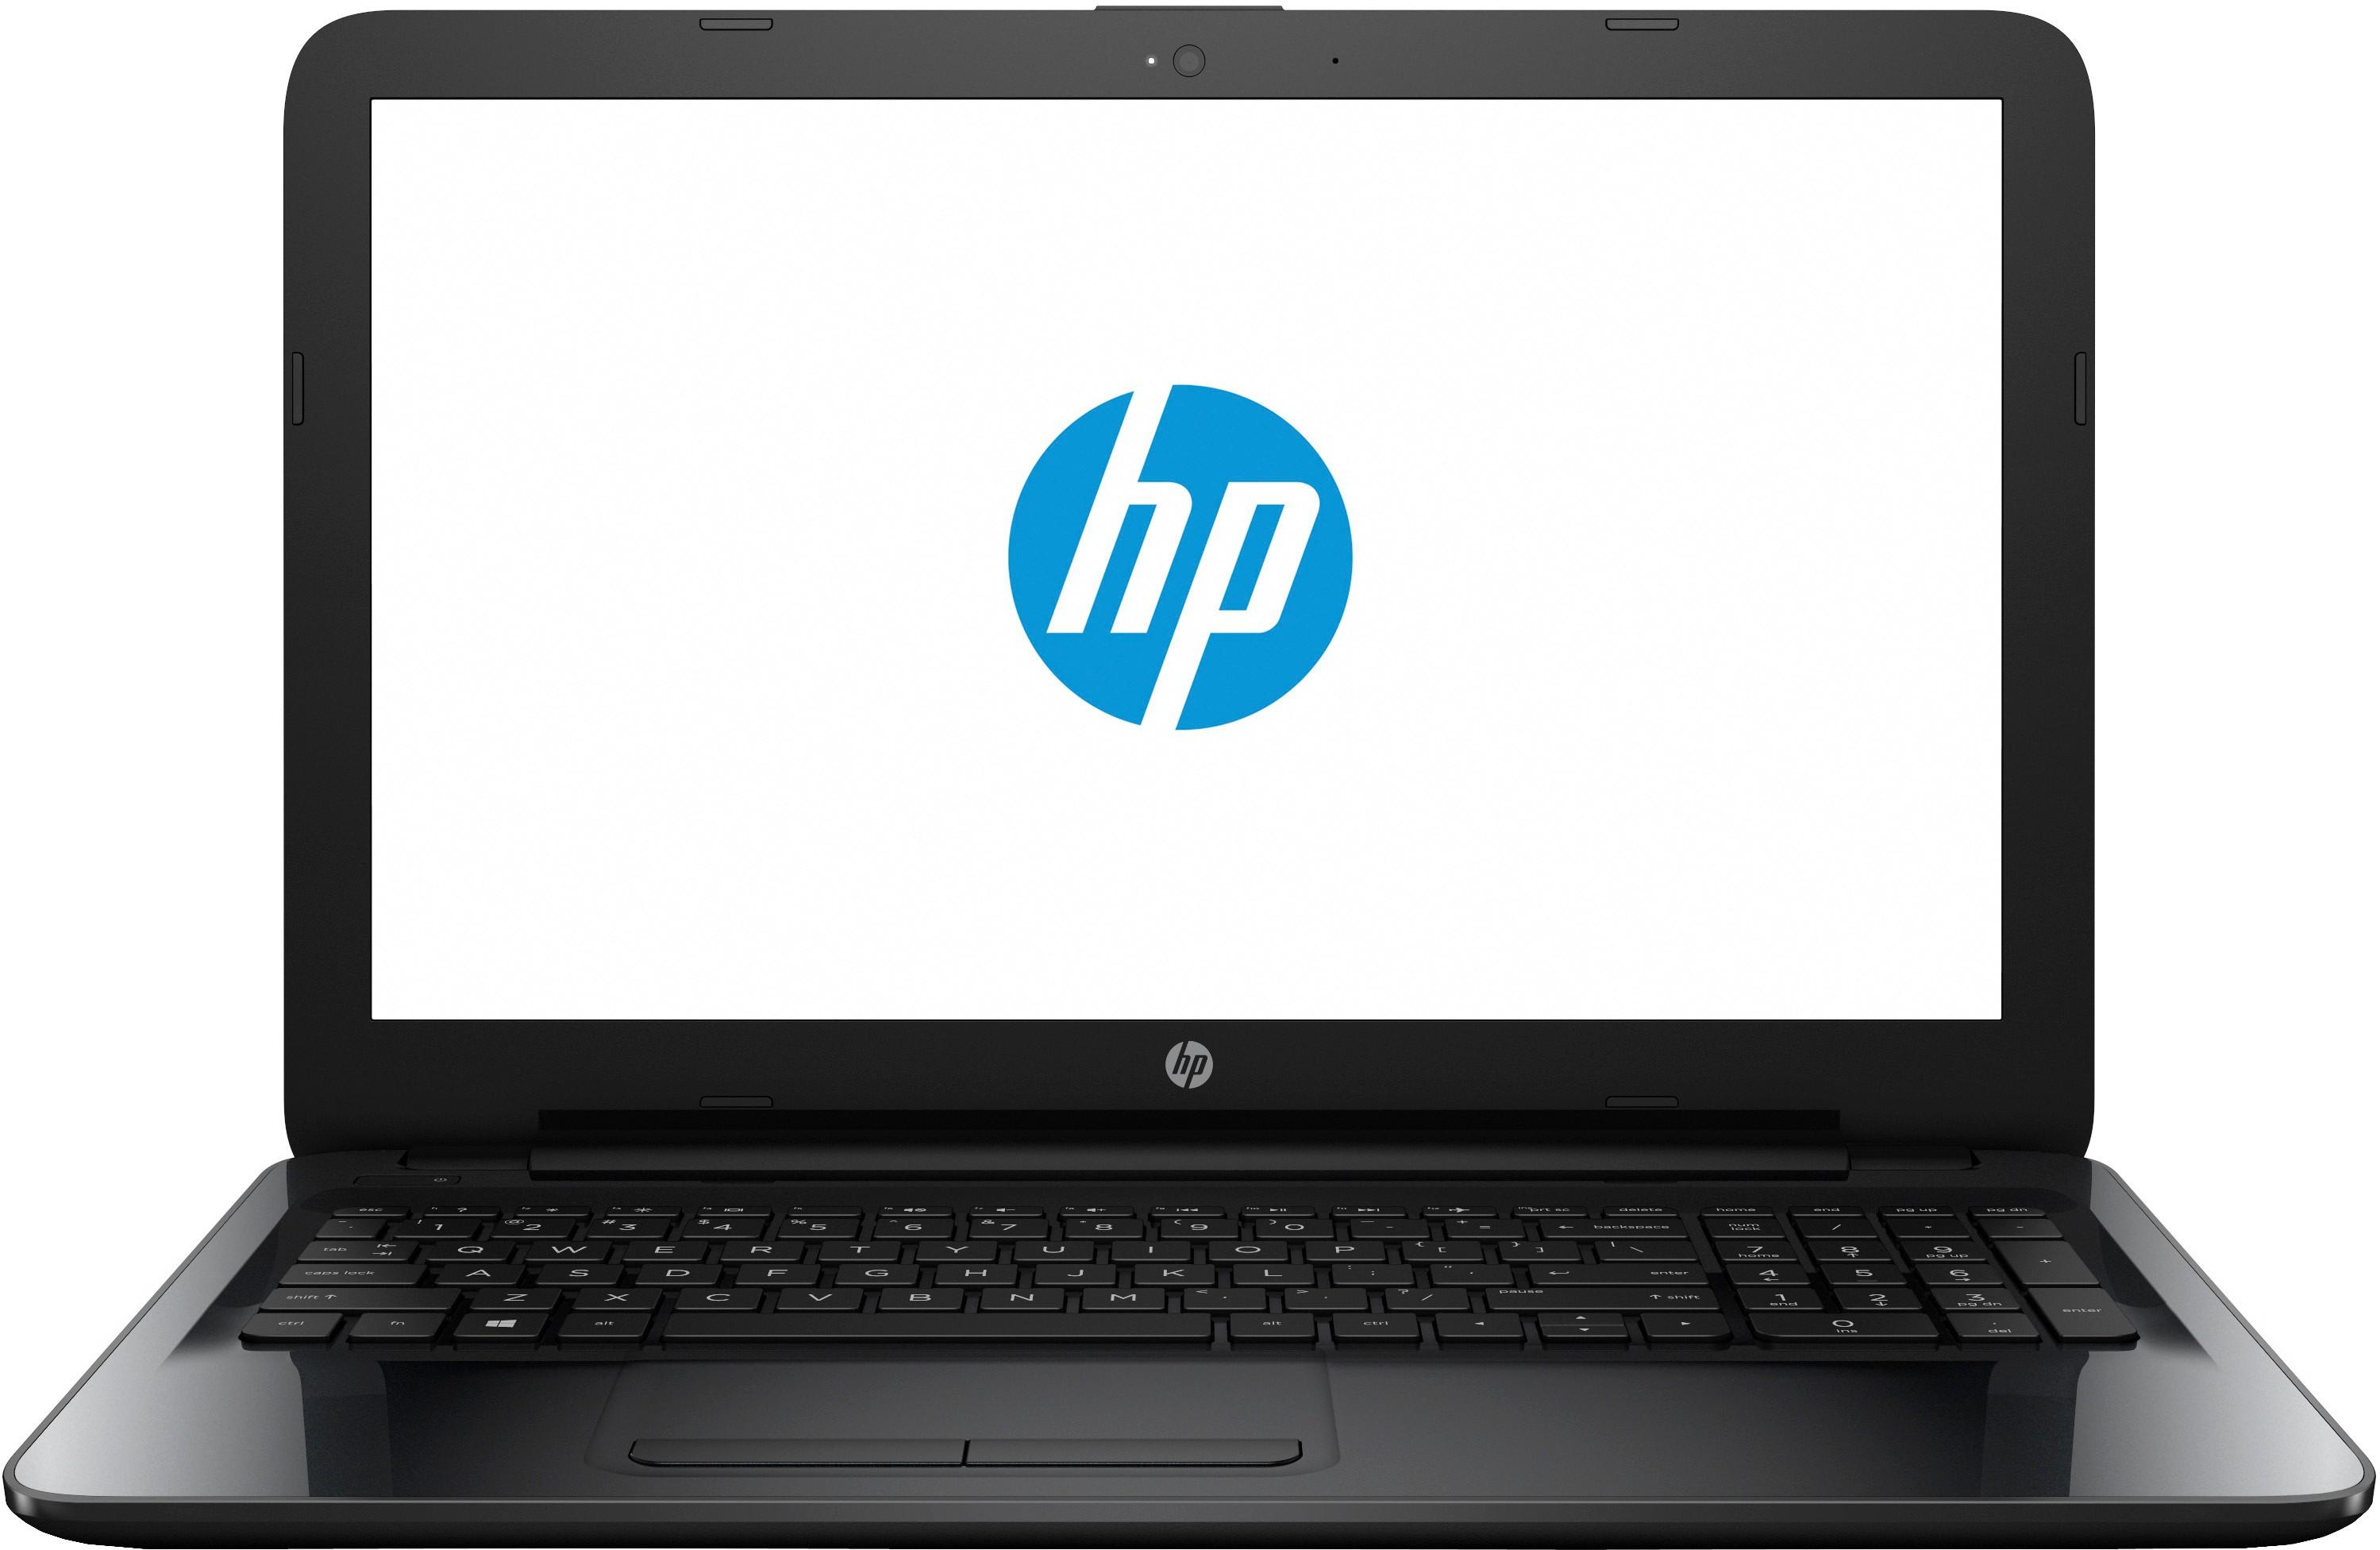 HP Core i3 6th Gen - (8 GB/1 TB HDD/DOS) 15-BE015TU Laptop(15.6 inch, Sparkling Black, 2.19 kg) image